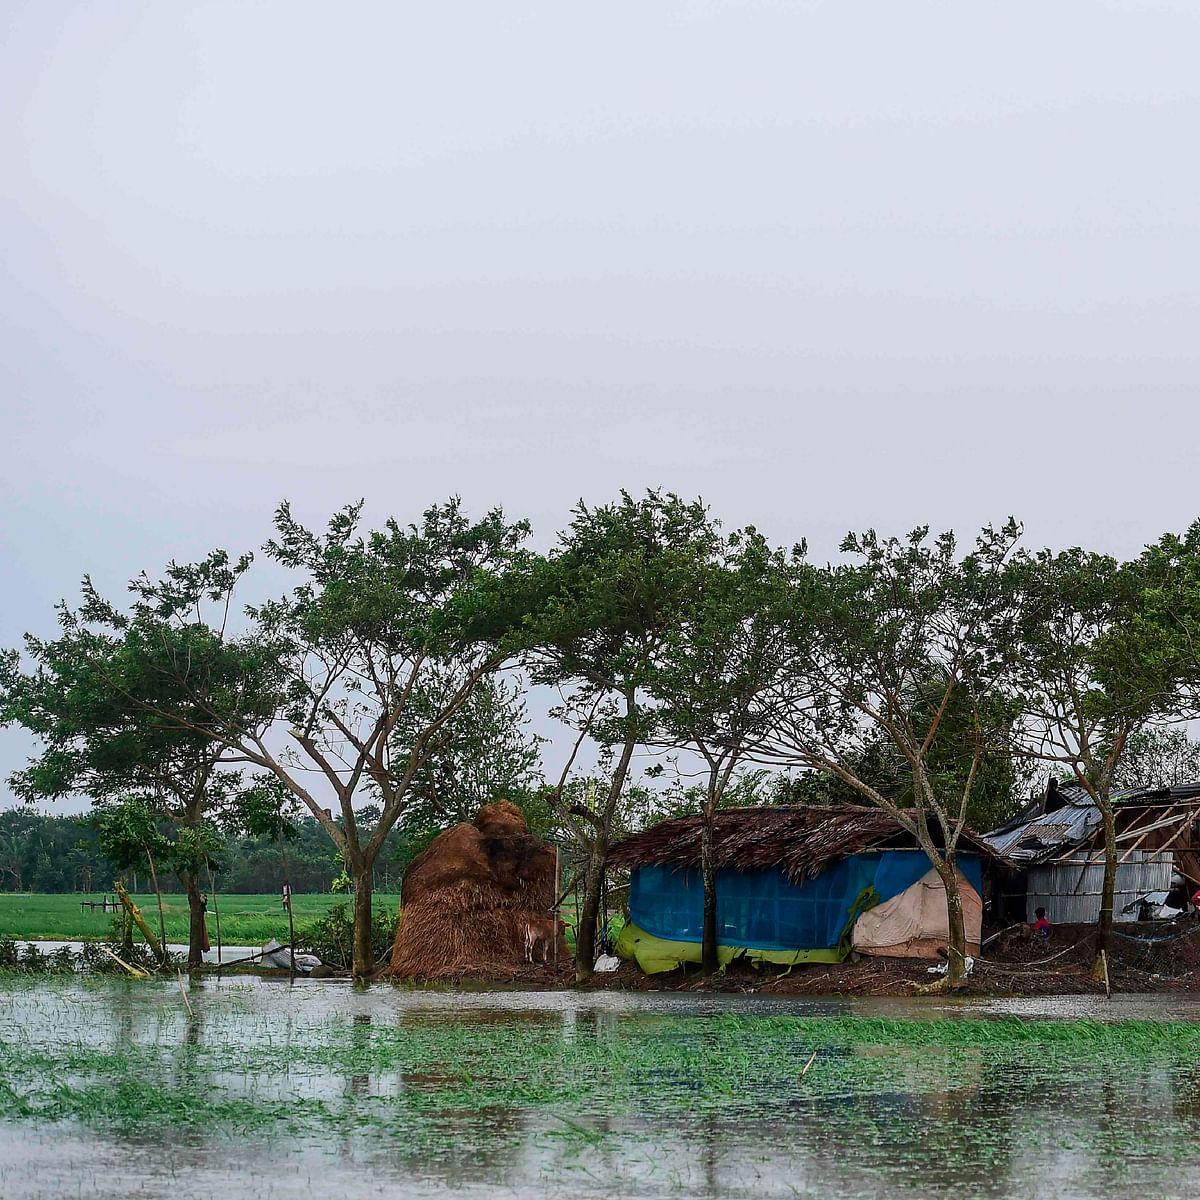 3 killed, over 21 lakh people evacuated as cyclone Bulbul hits Bangladesh